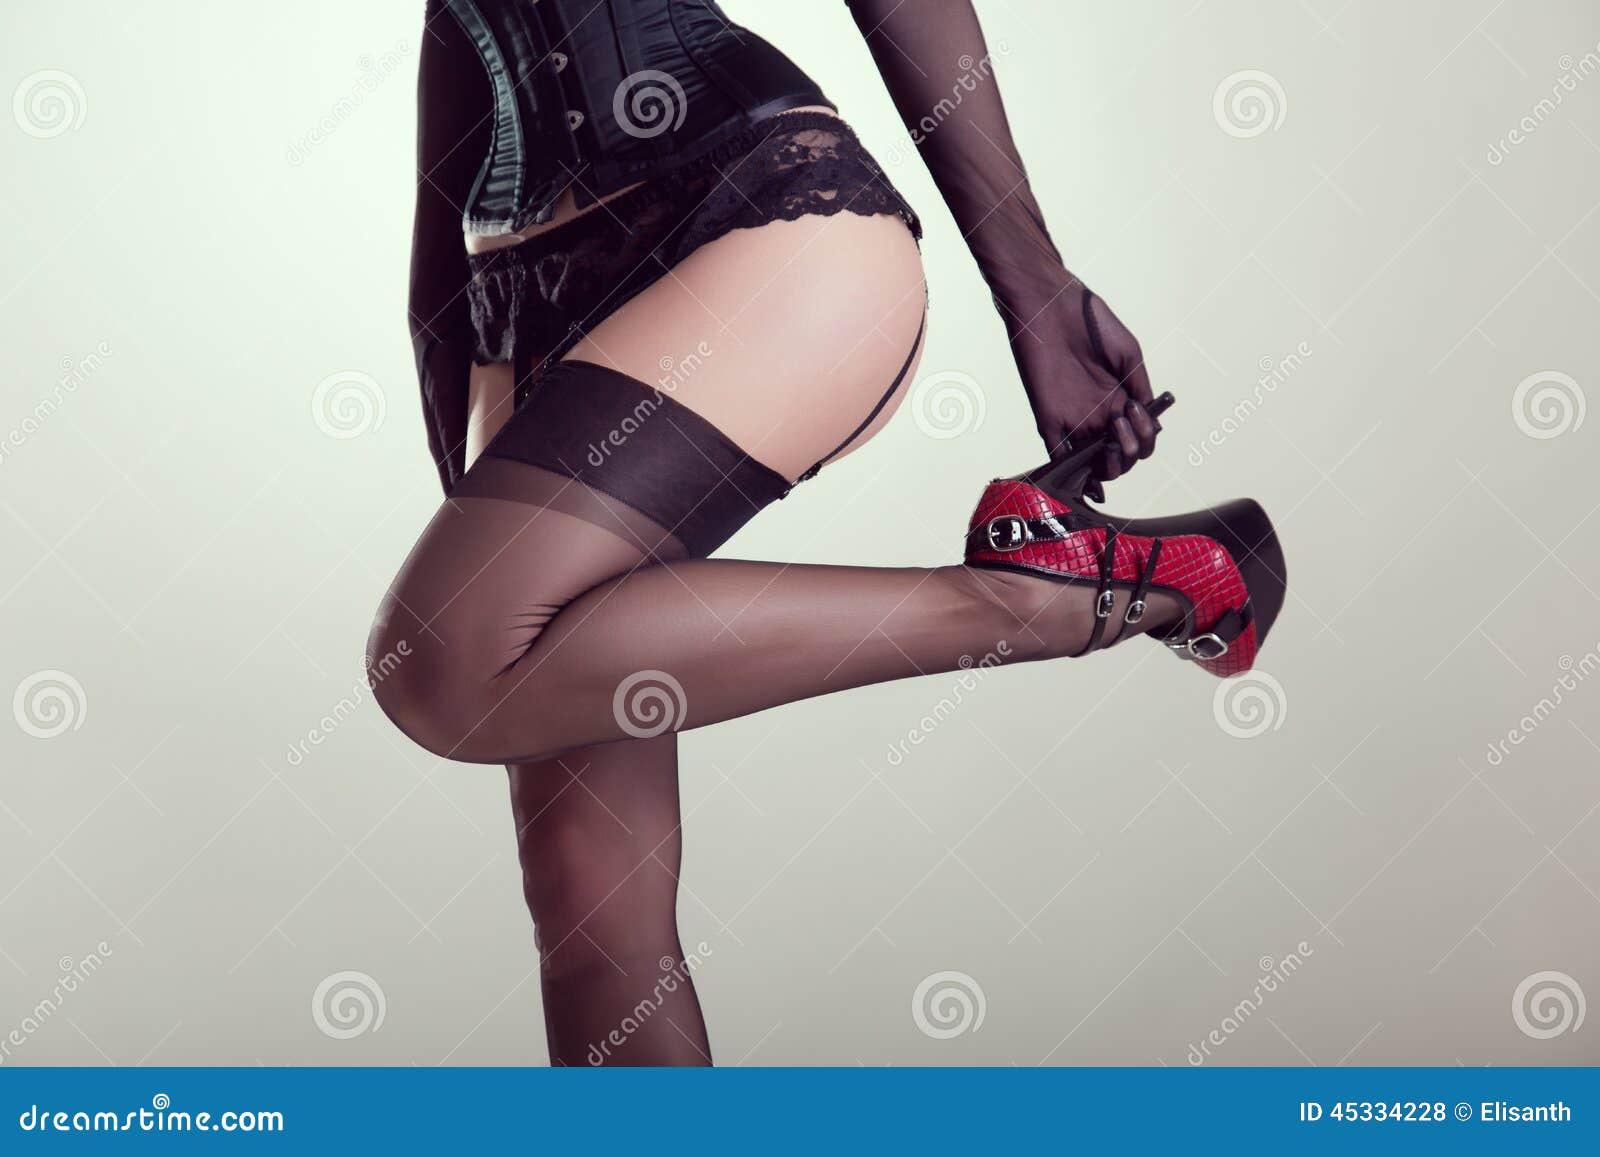 Pin up girls corsets stockings